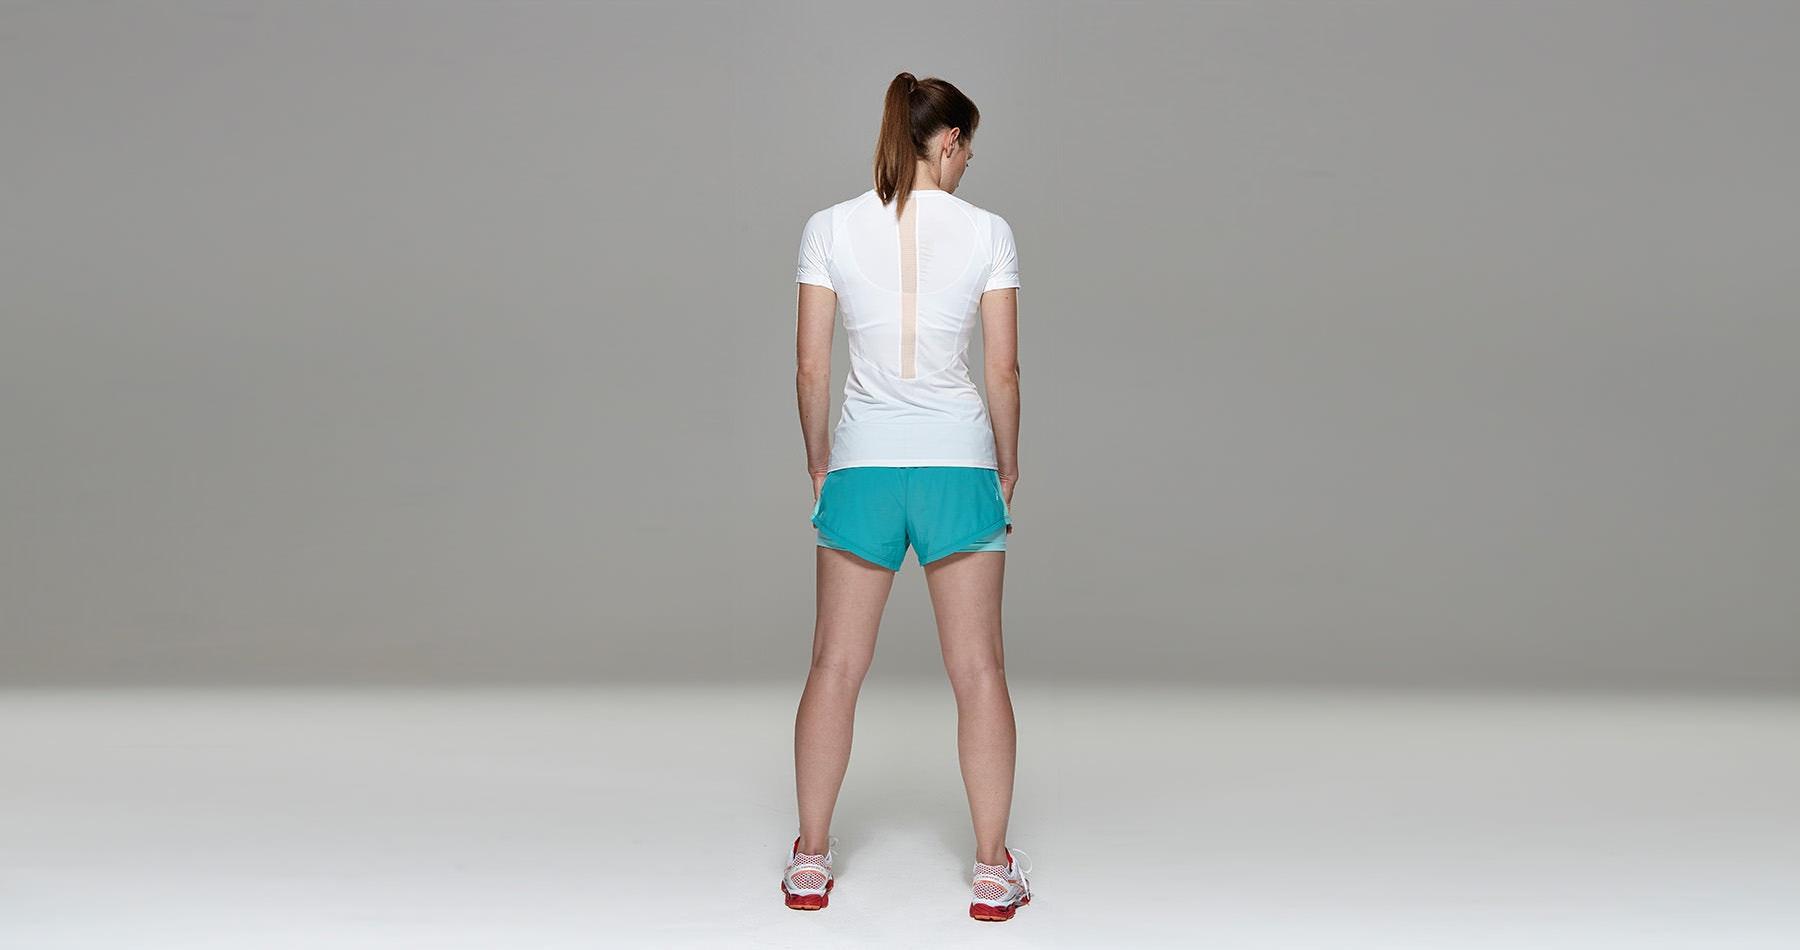 Tribesports Core Women's Short Sleeve Top White Blush  6